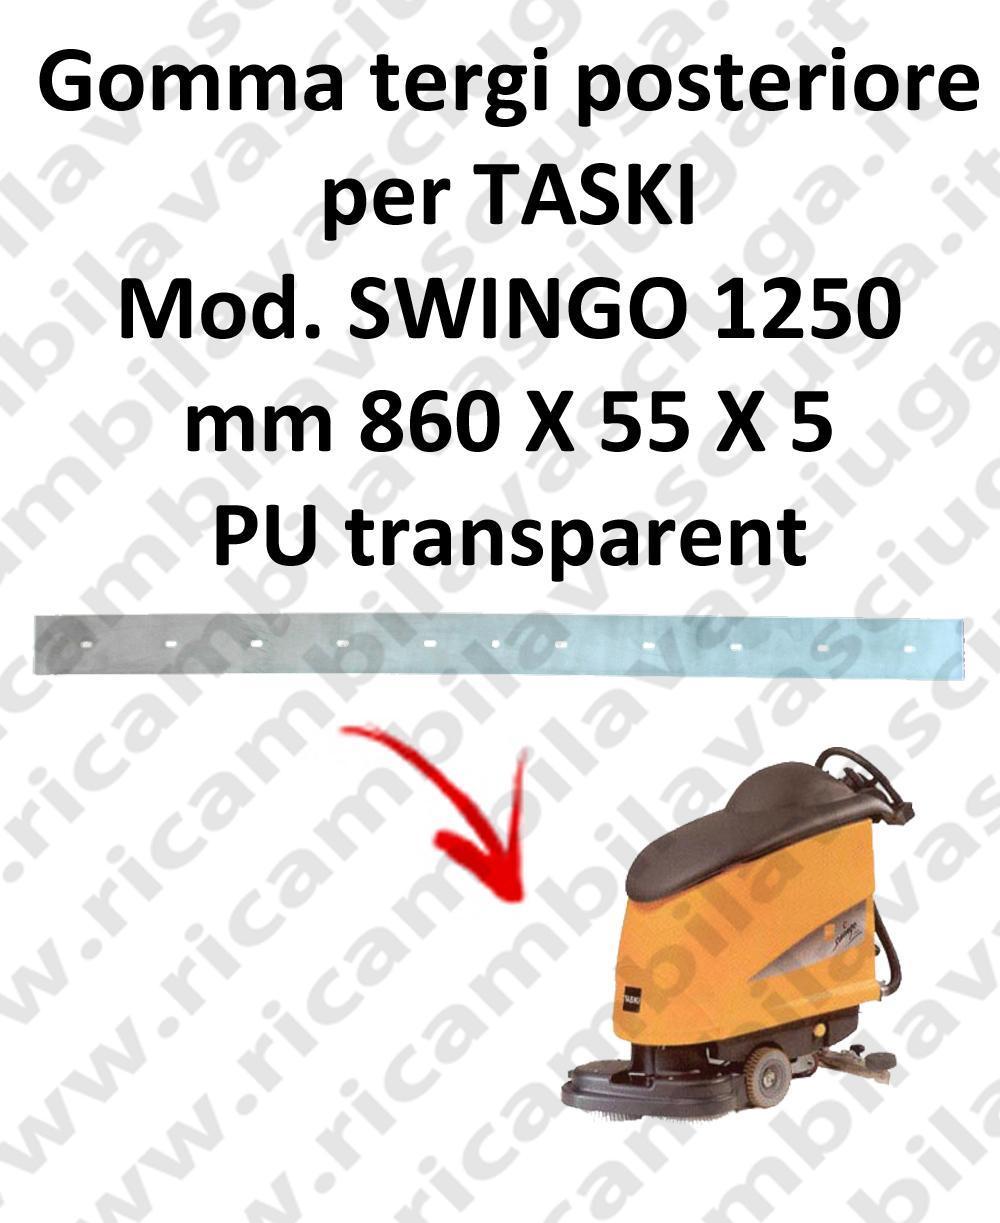 Bavette ARRIERE pour autolaveuses TASKI modele SWINGO 1250